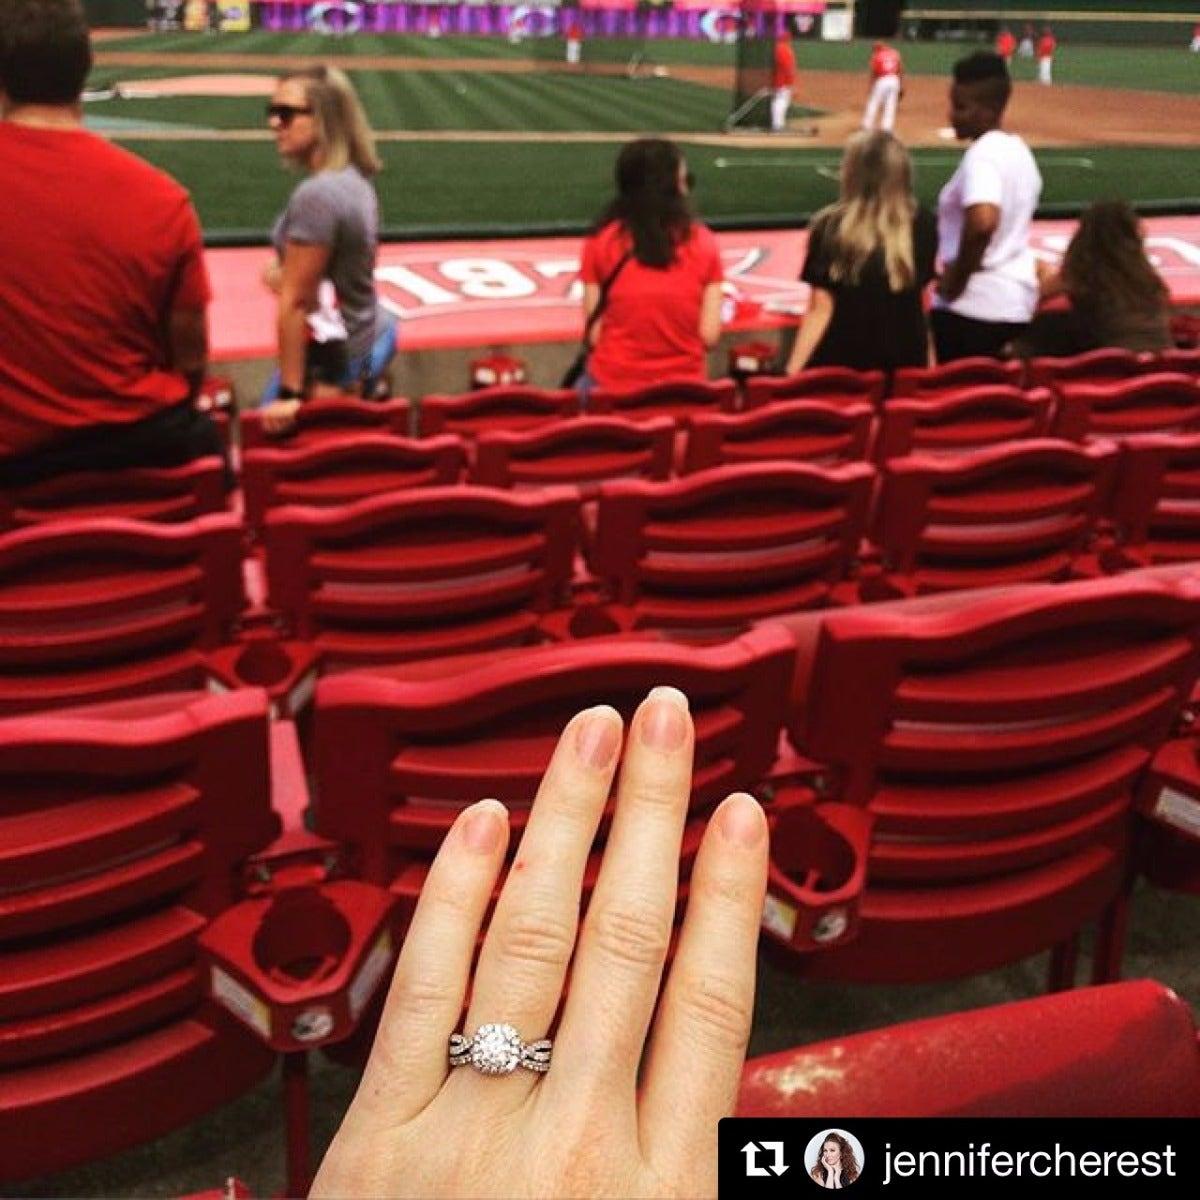 Baseball Game Ring Selfie